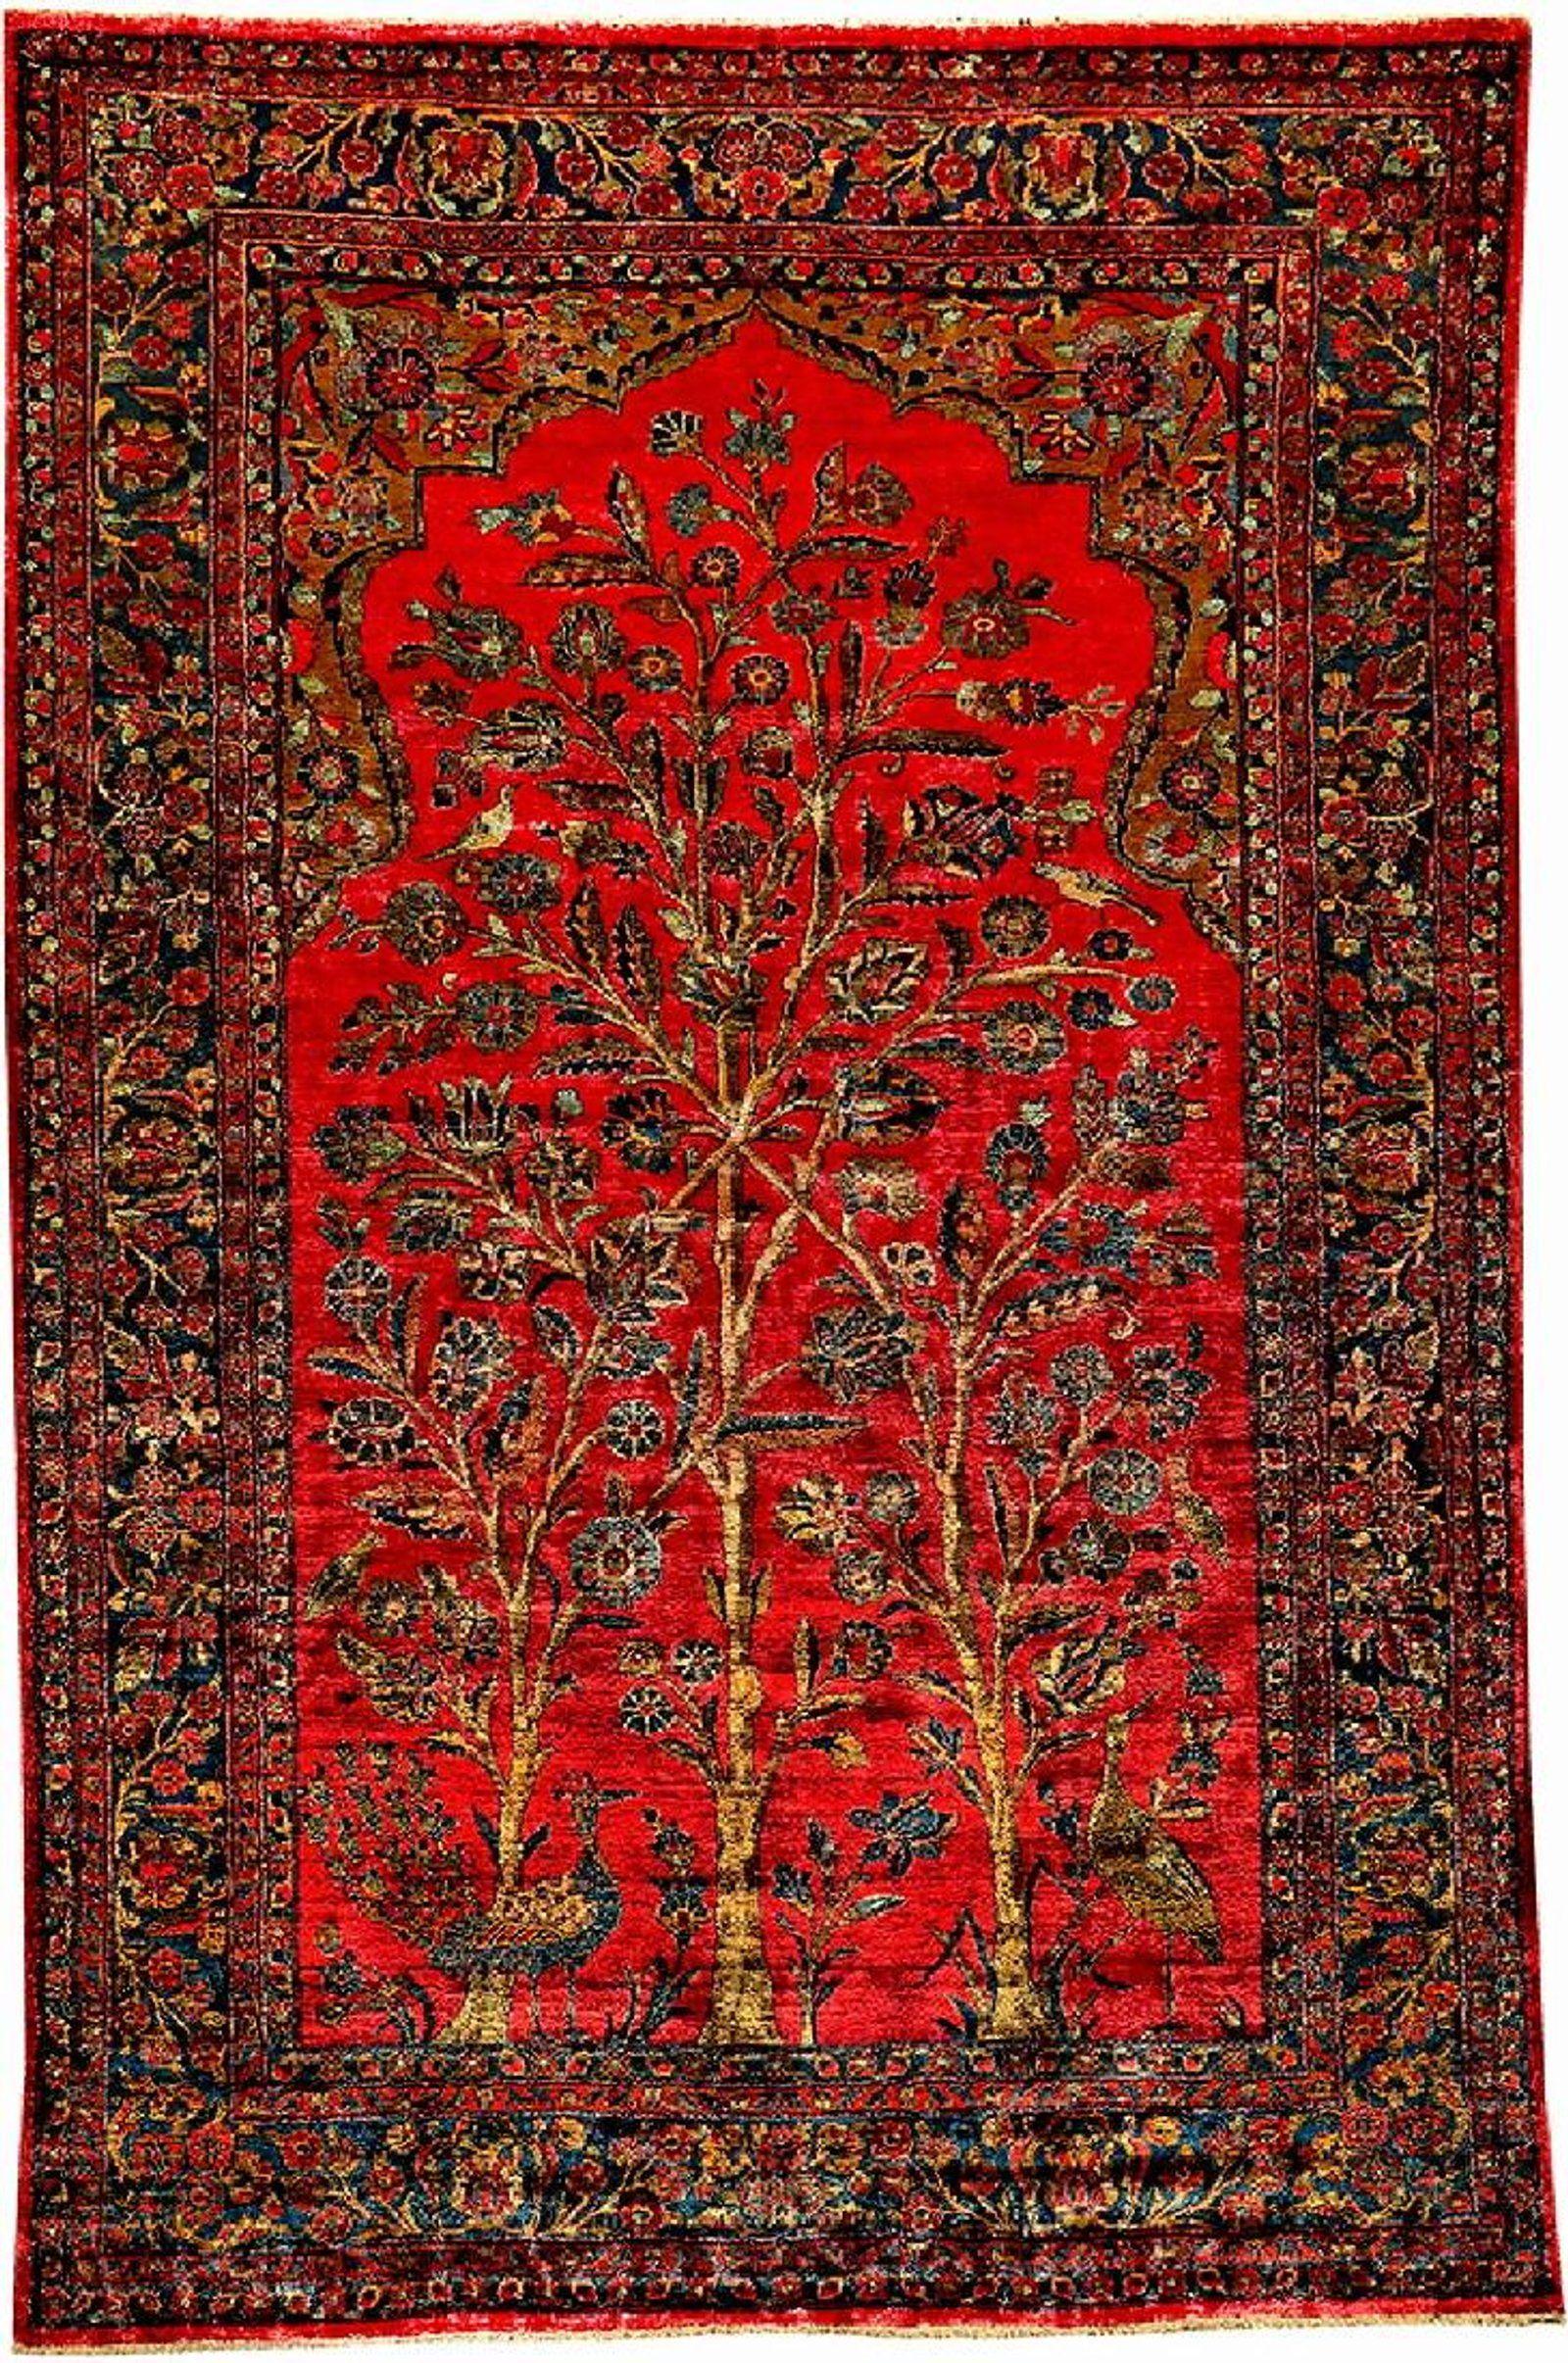 Fine Silk Kashan Rug Tree Of Life Jun 09 2018 Henry S Auktionshaus Ag In Germany Kashan Rug Rugs Antique Carpets